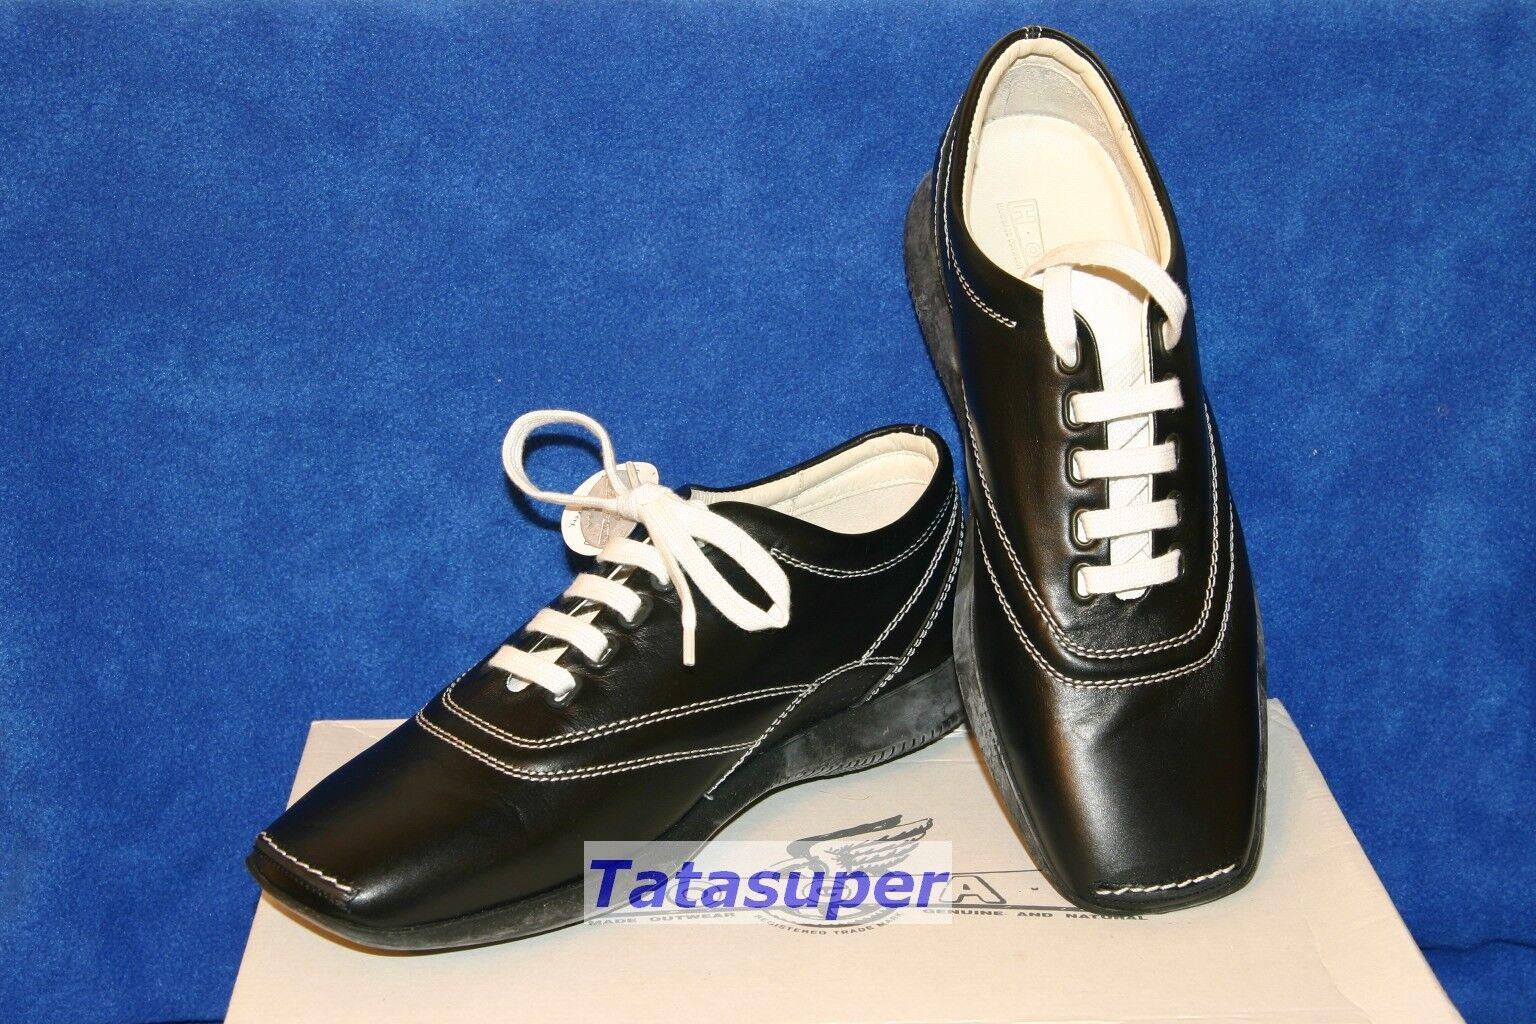 100% Auténtico Auténtico Auténtico Hogan tenis zapatos talla 38-Negro  muchas concesiones